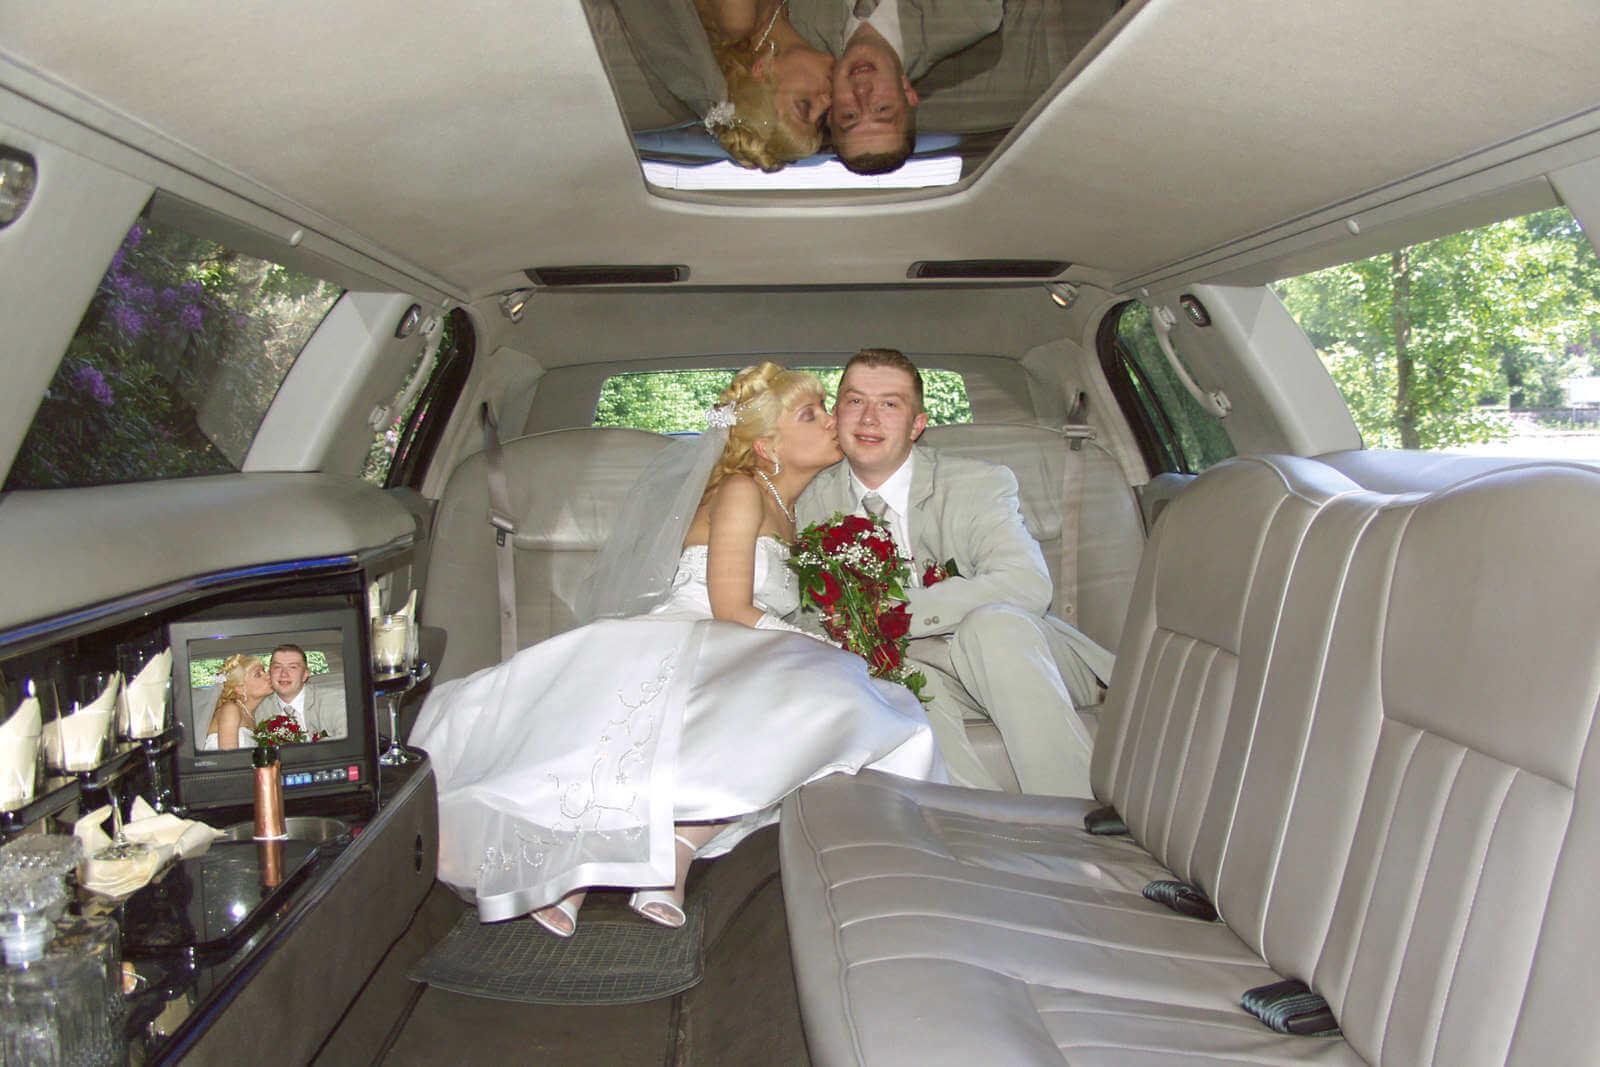 limousine mieten limousinenverleih fahrt ins gl ck. Black Bedroom Furniture Sets. Home Design Ideas